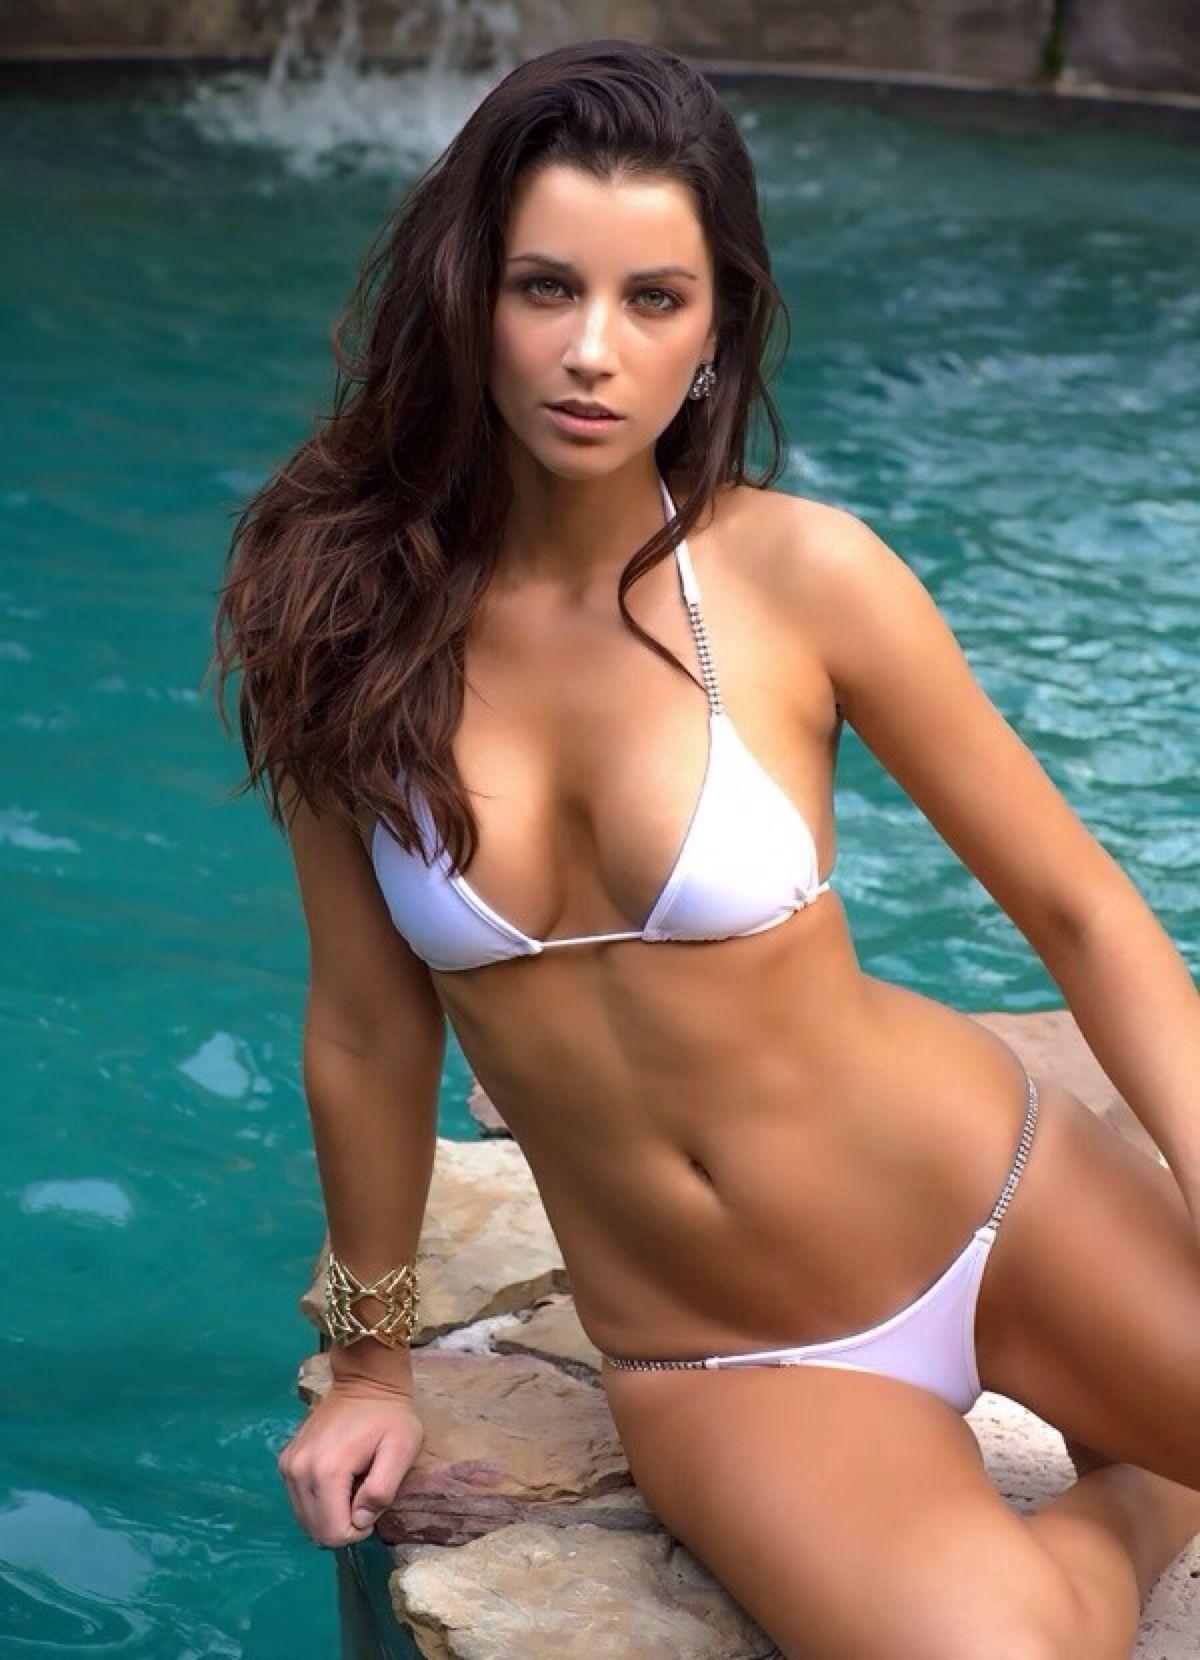 trip swim bikini boat Bay girl